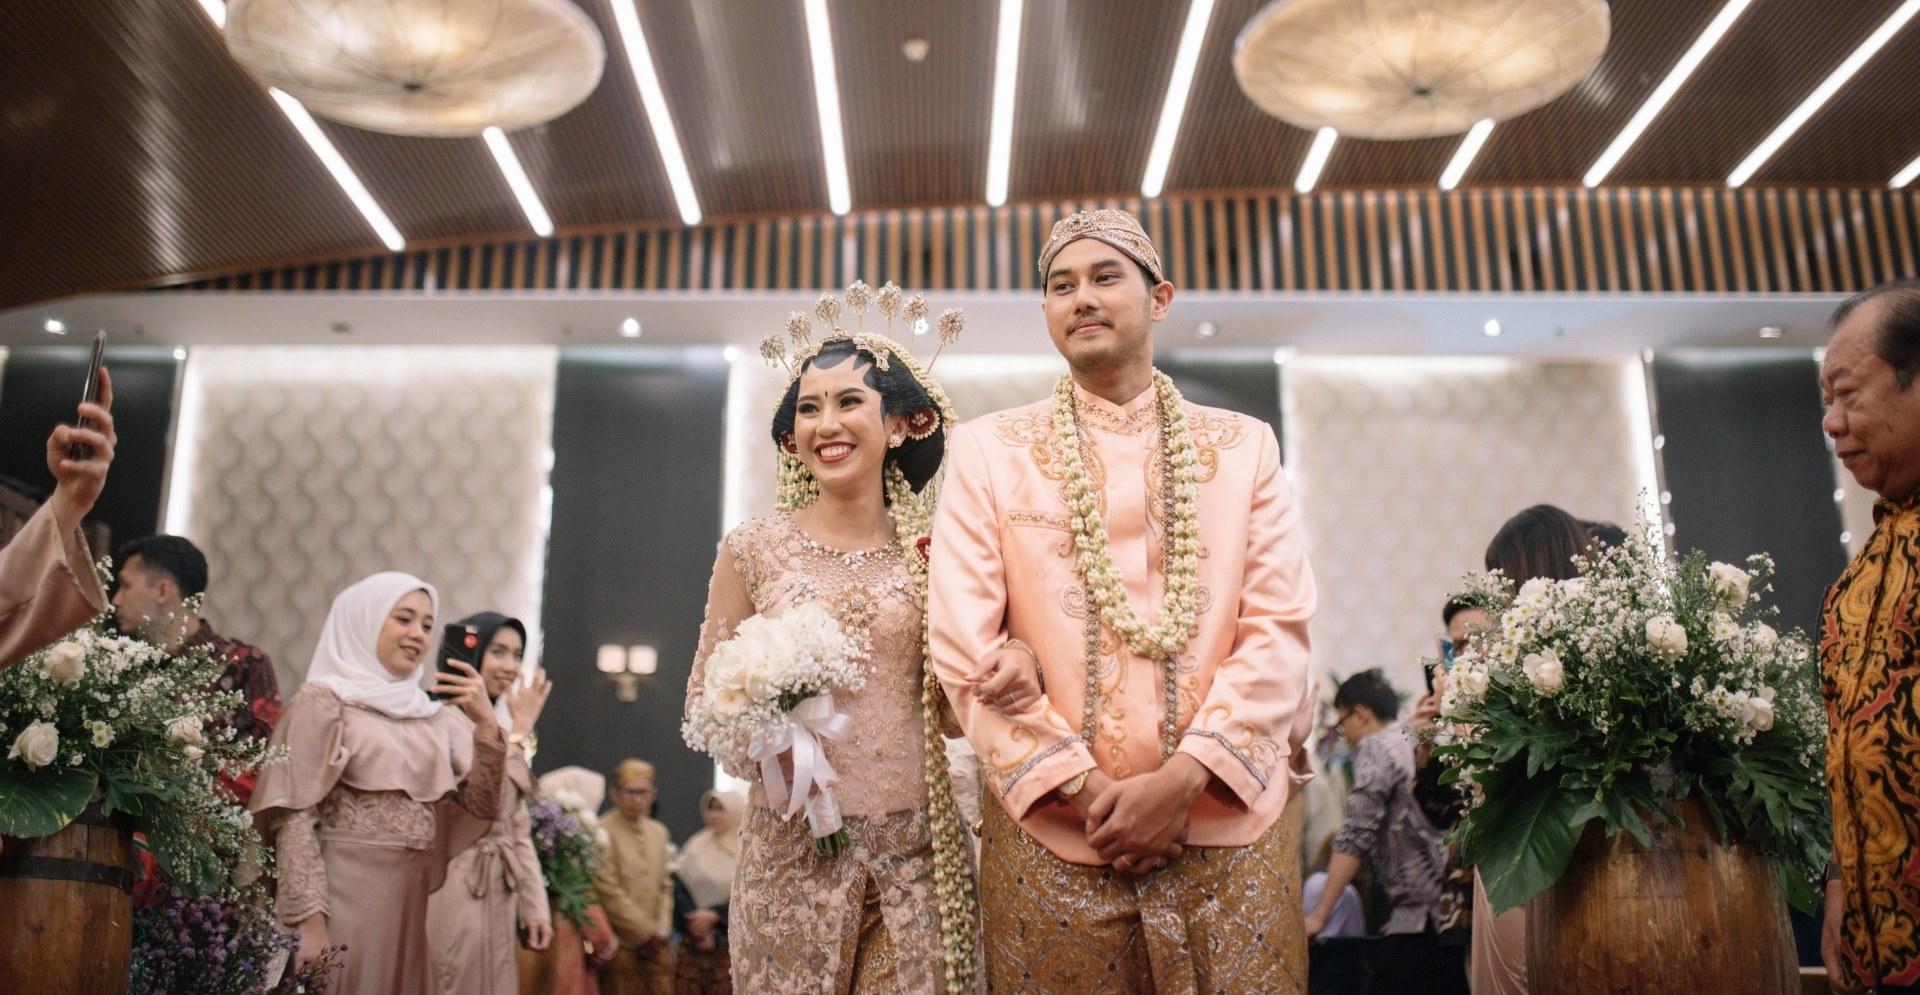 Design Baju Pengantin Muslimah 2017 Fmdf Ikk Indonesia